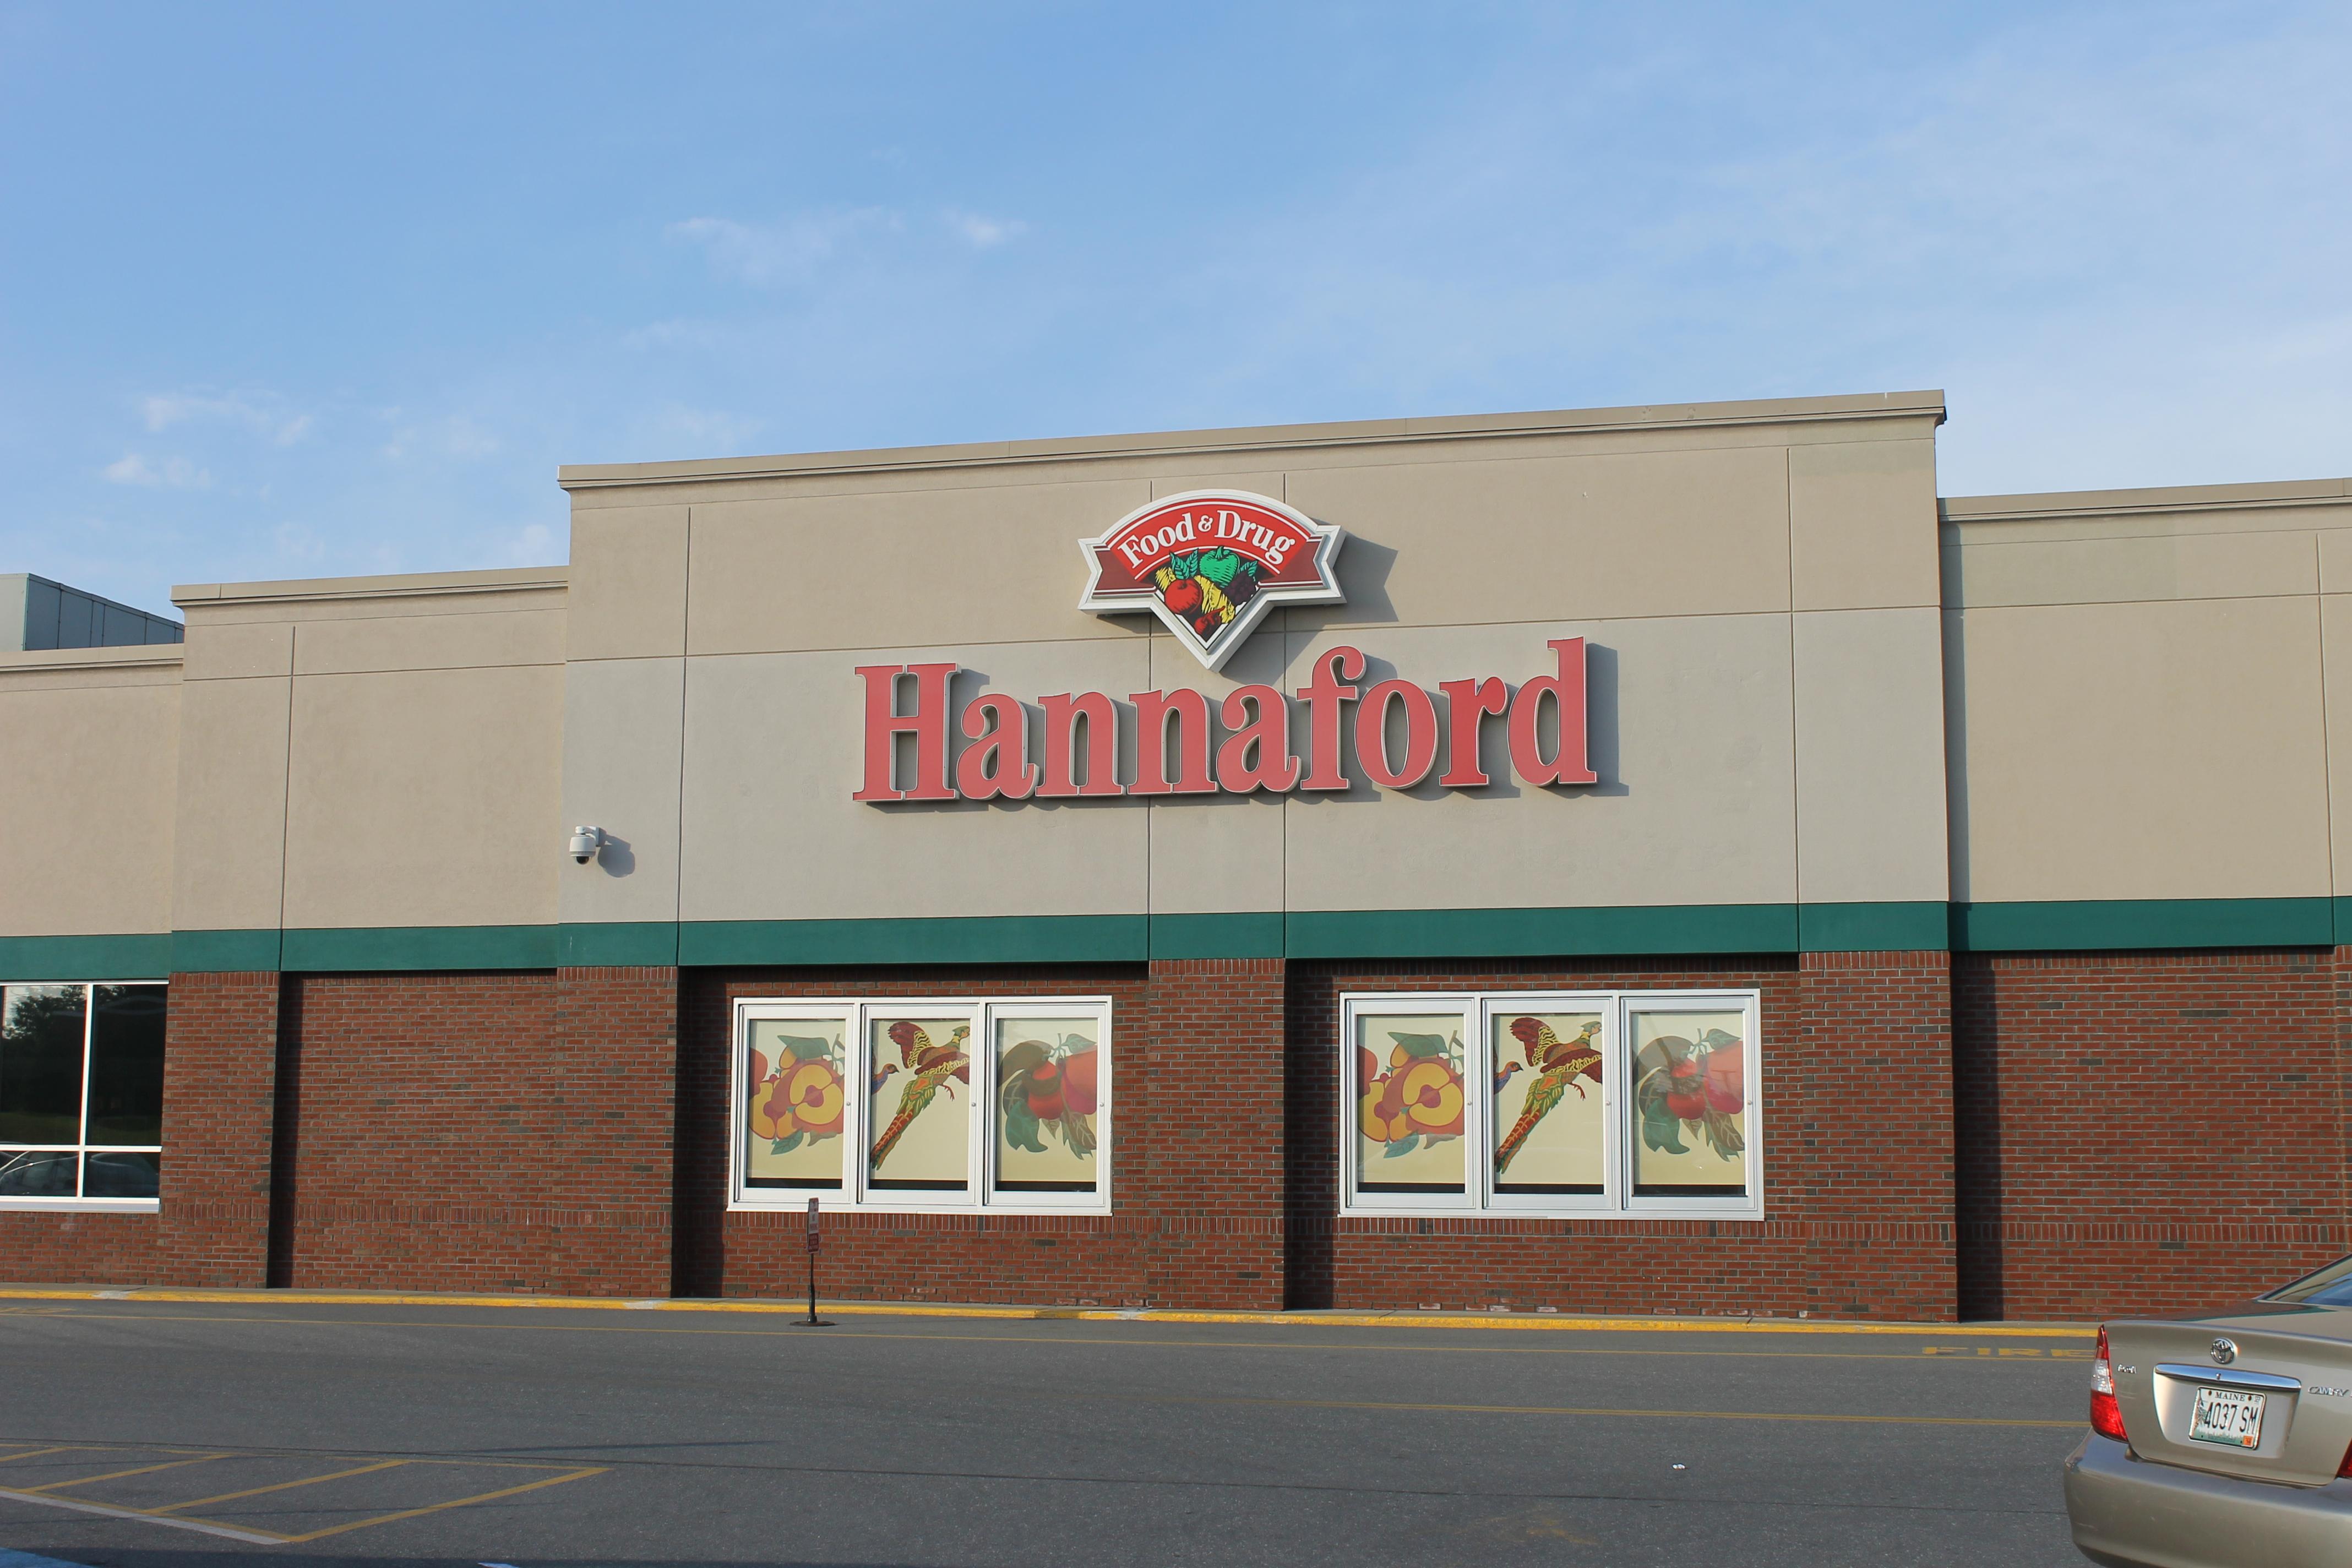 Hannaford Supermarket Bangor Donates Food To Good Shepherd